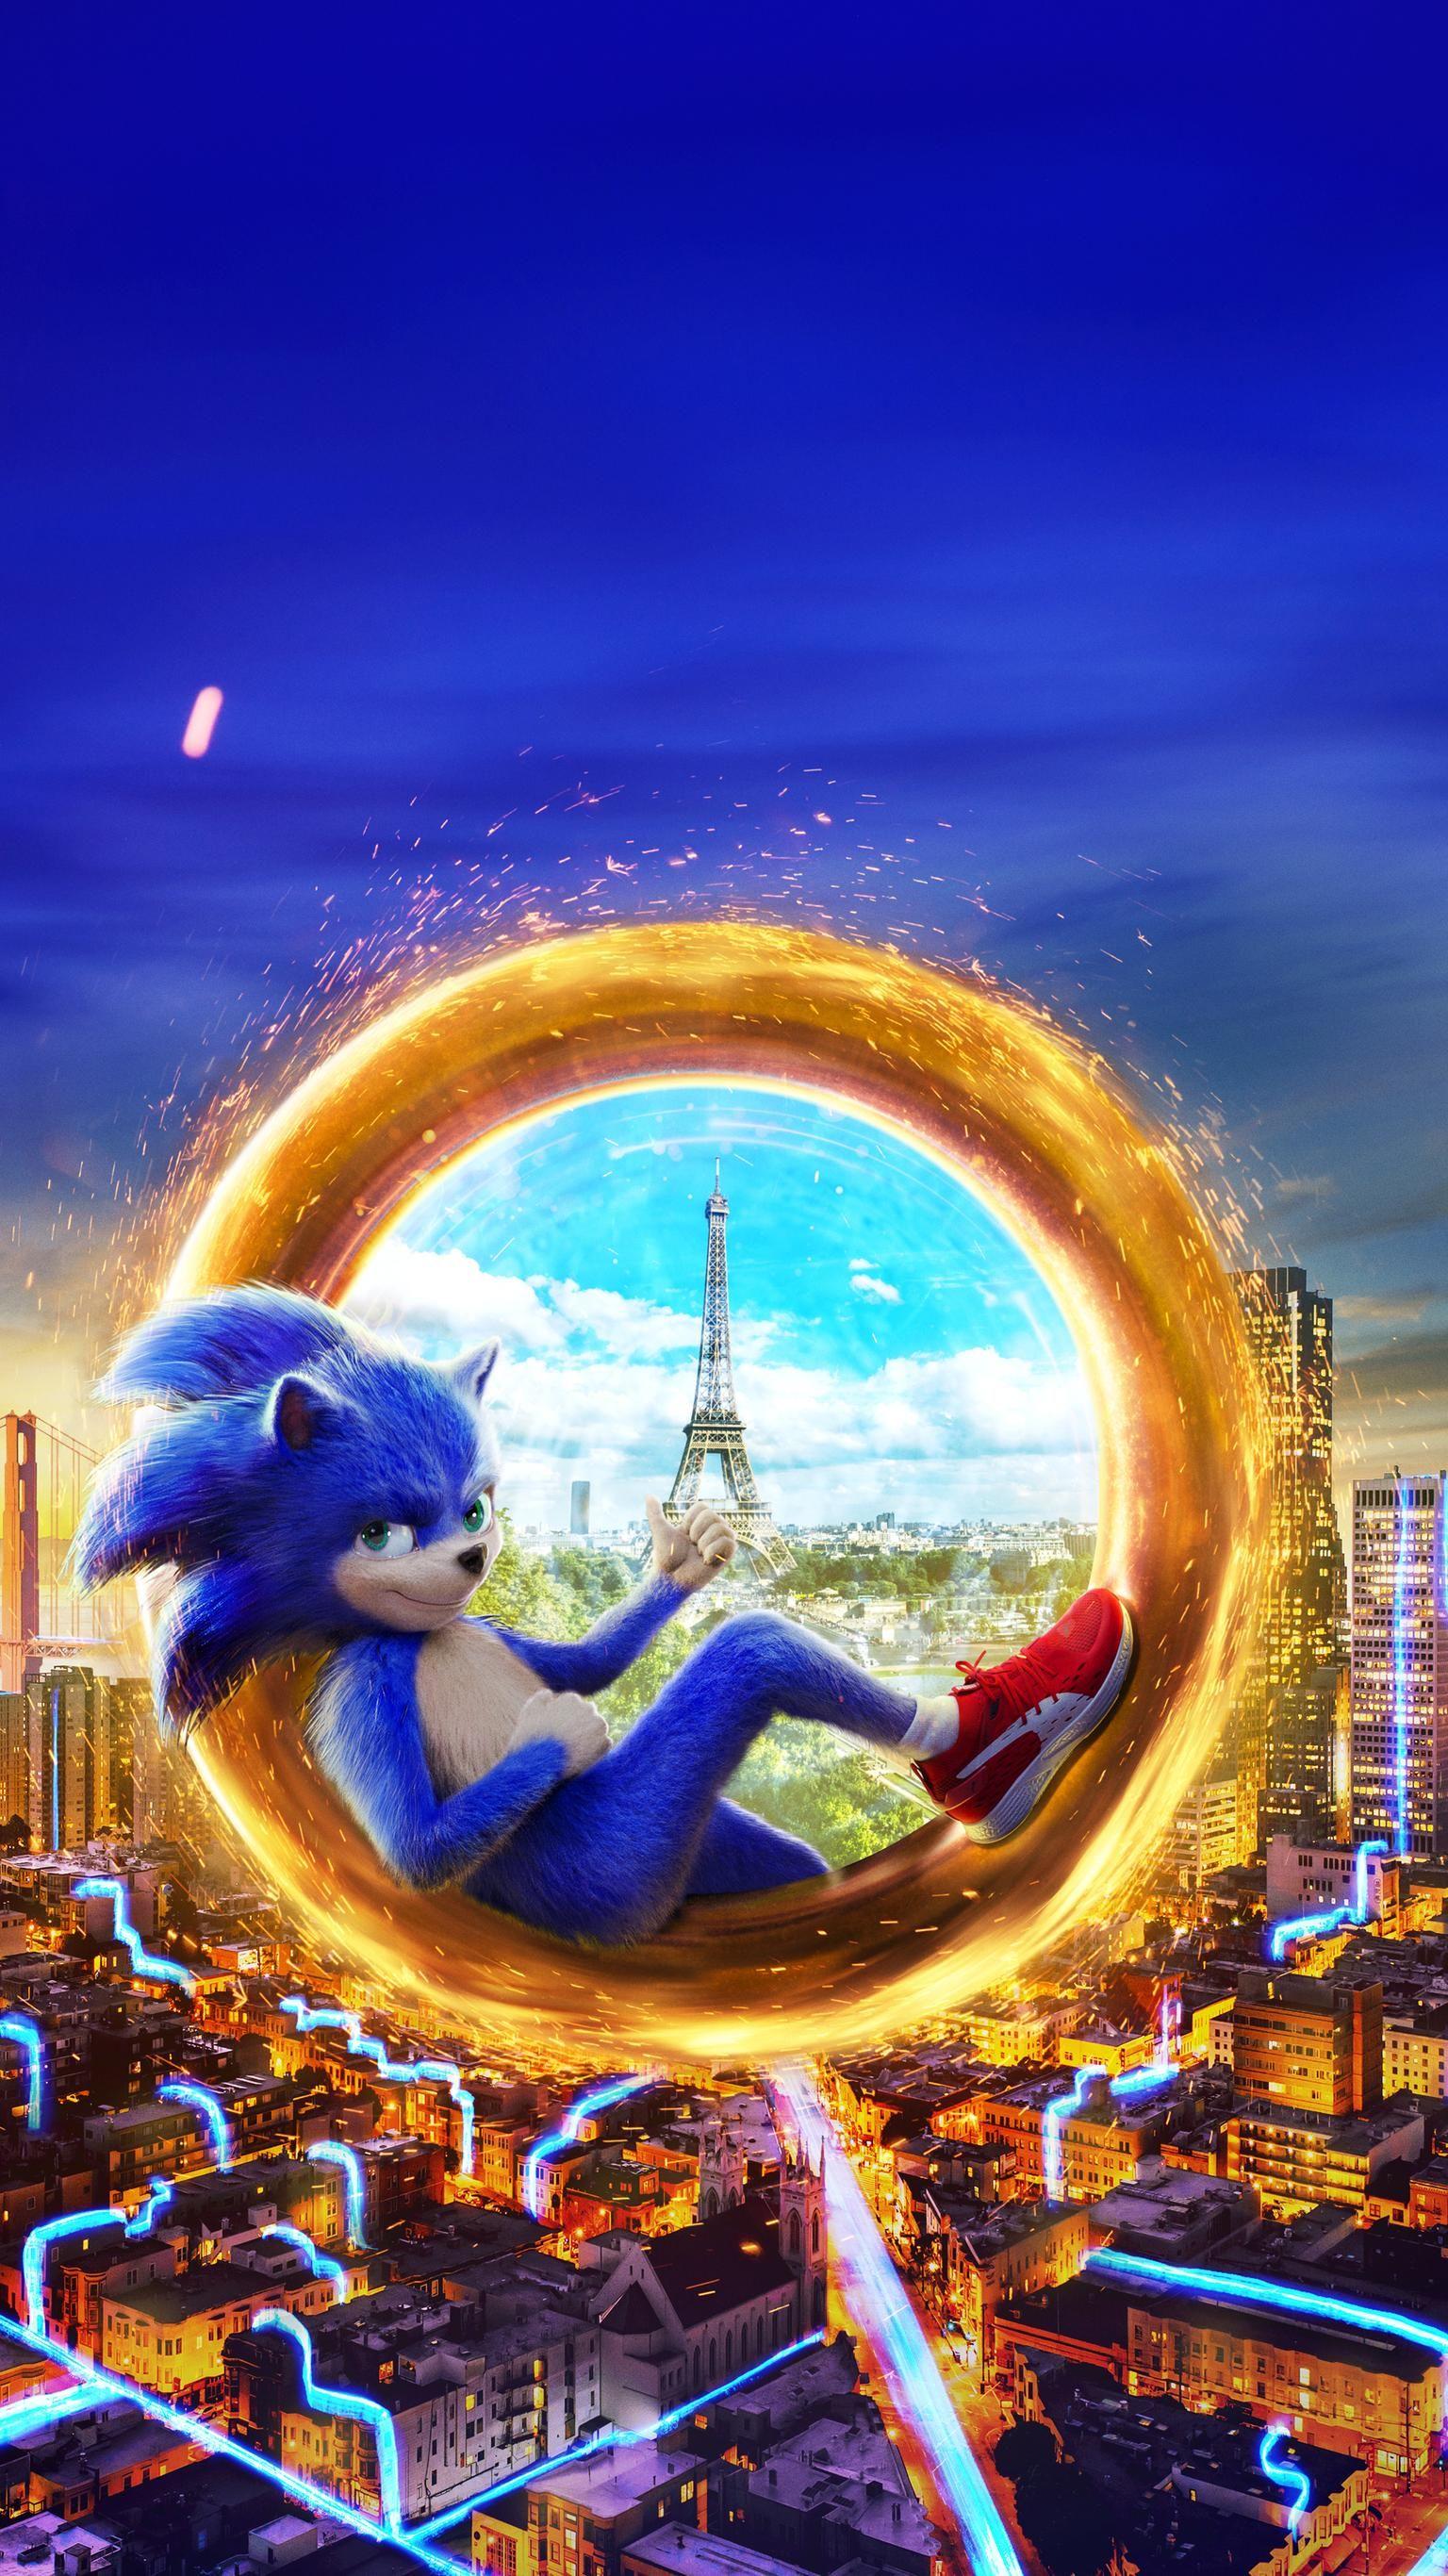 Sonic The Hedgehog 2020 Phone Wallpaper Moviemania Movie Wallpapers Hedgehog Movie Sonic The Movie